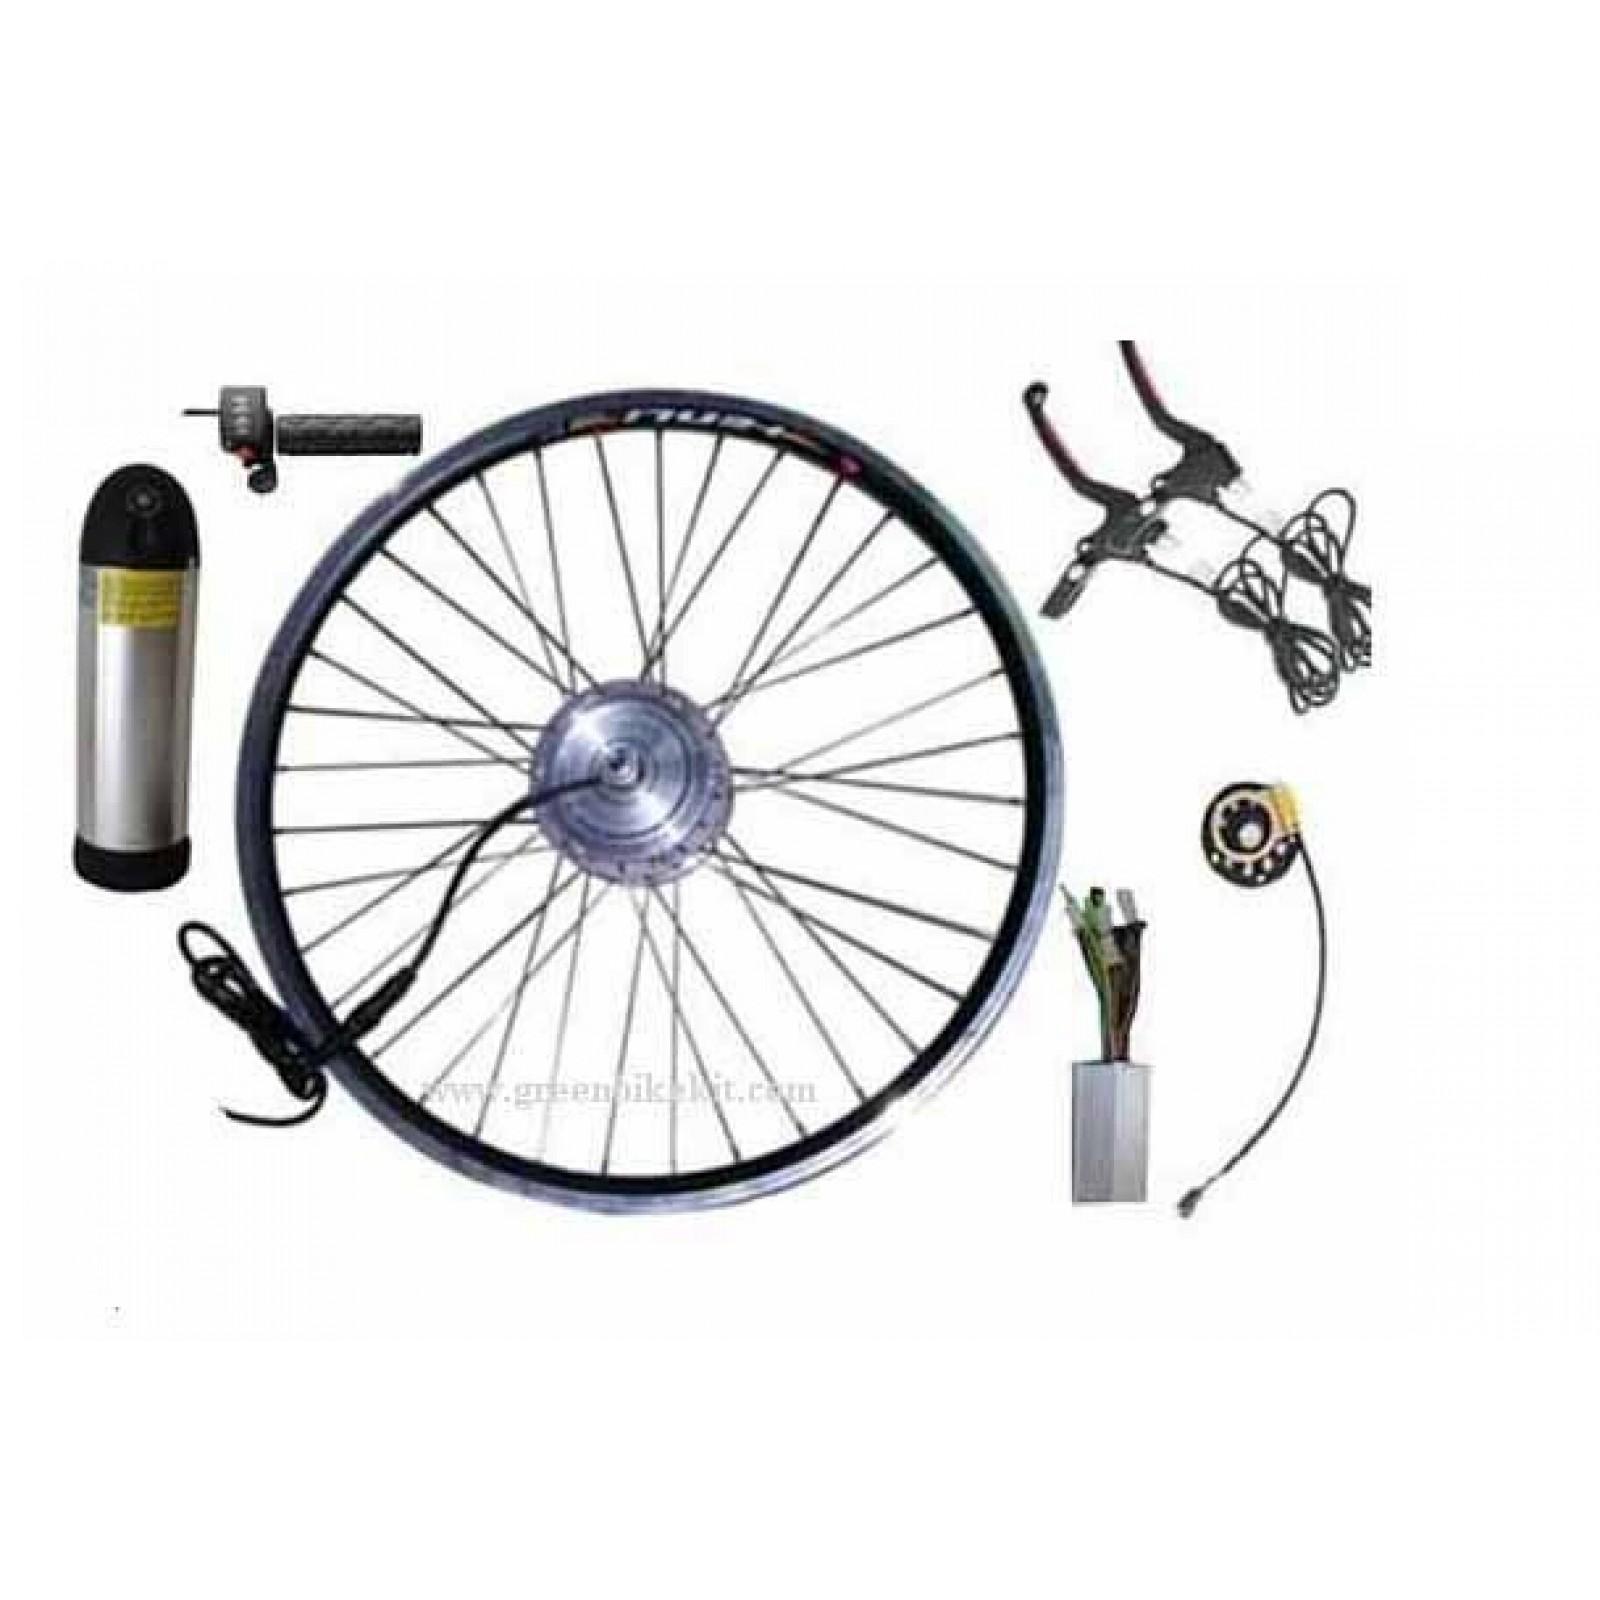 36v 250w cassette freewheel cst engine kit with bottle battery